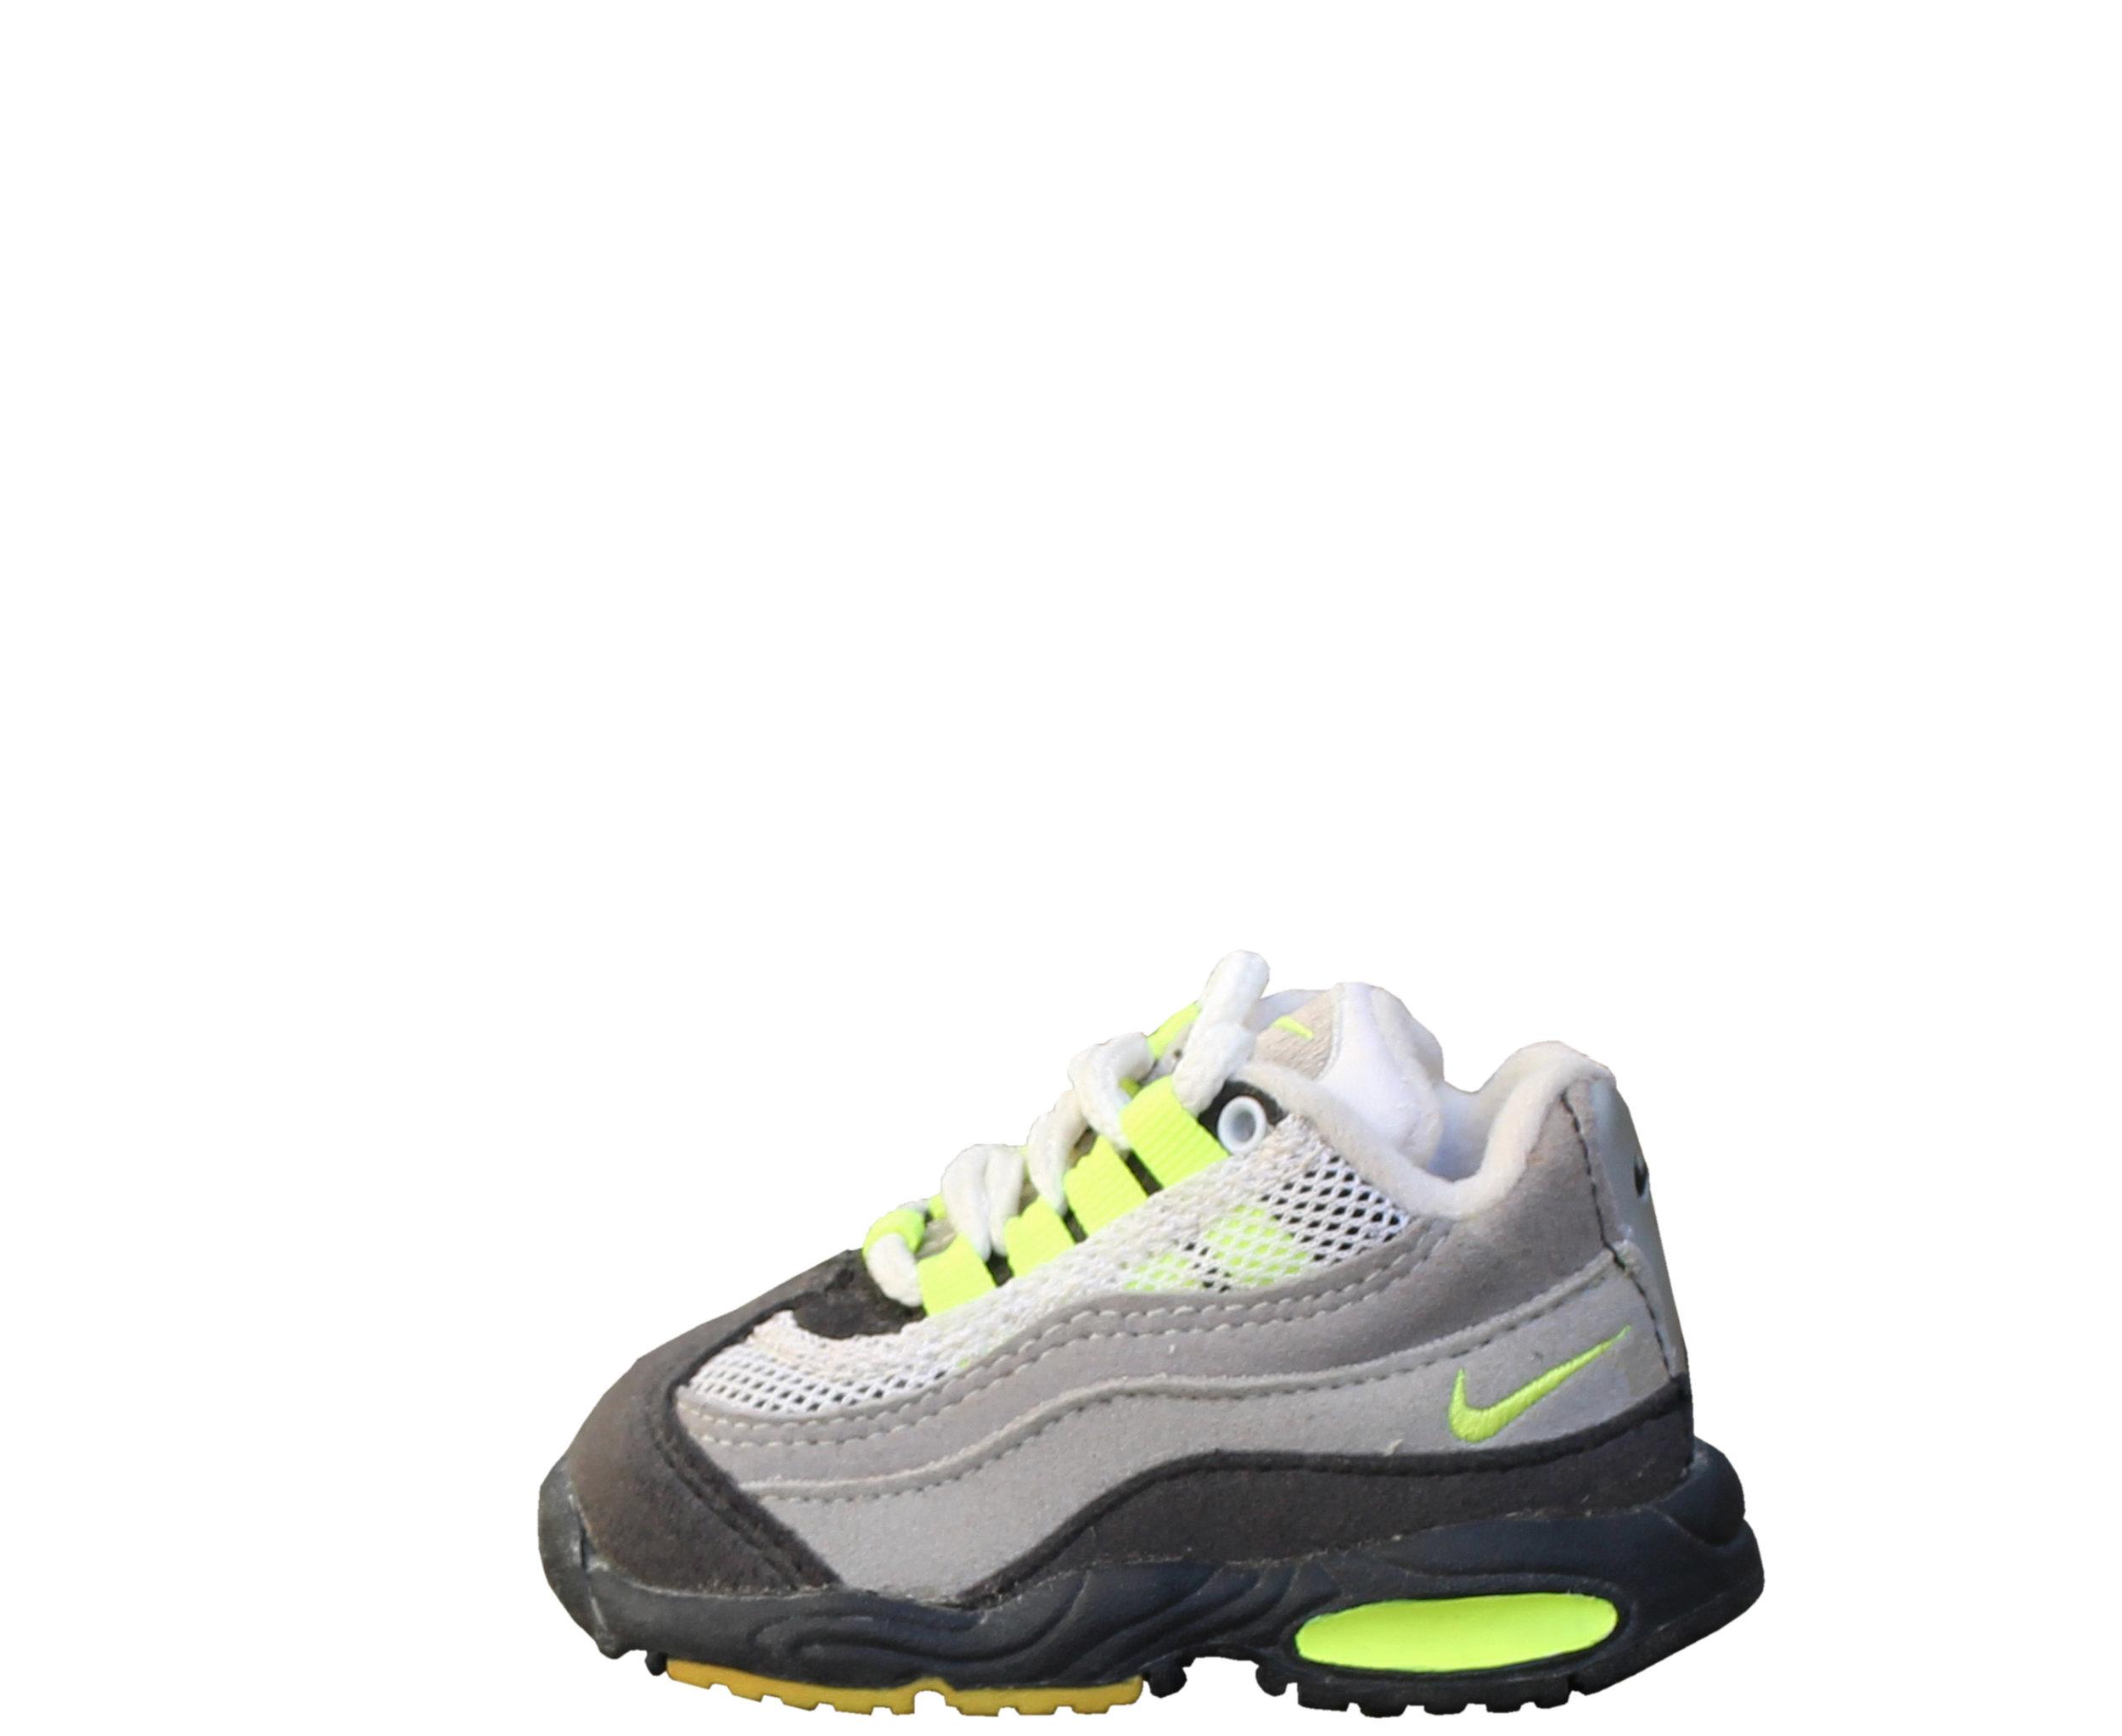 Baby Nike Air Max 95 Cool Grey / Neon